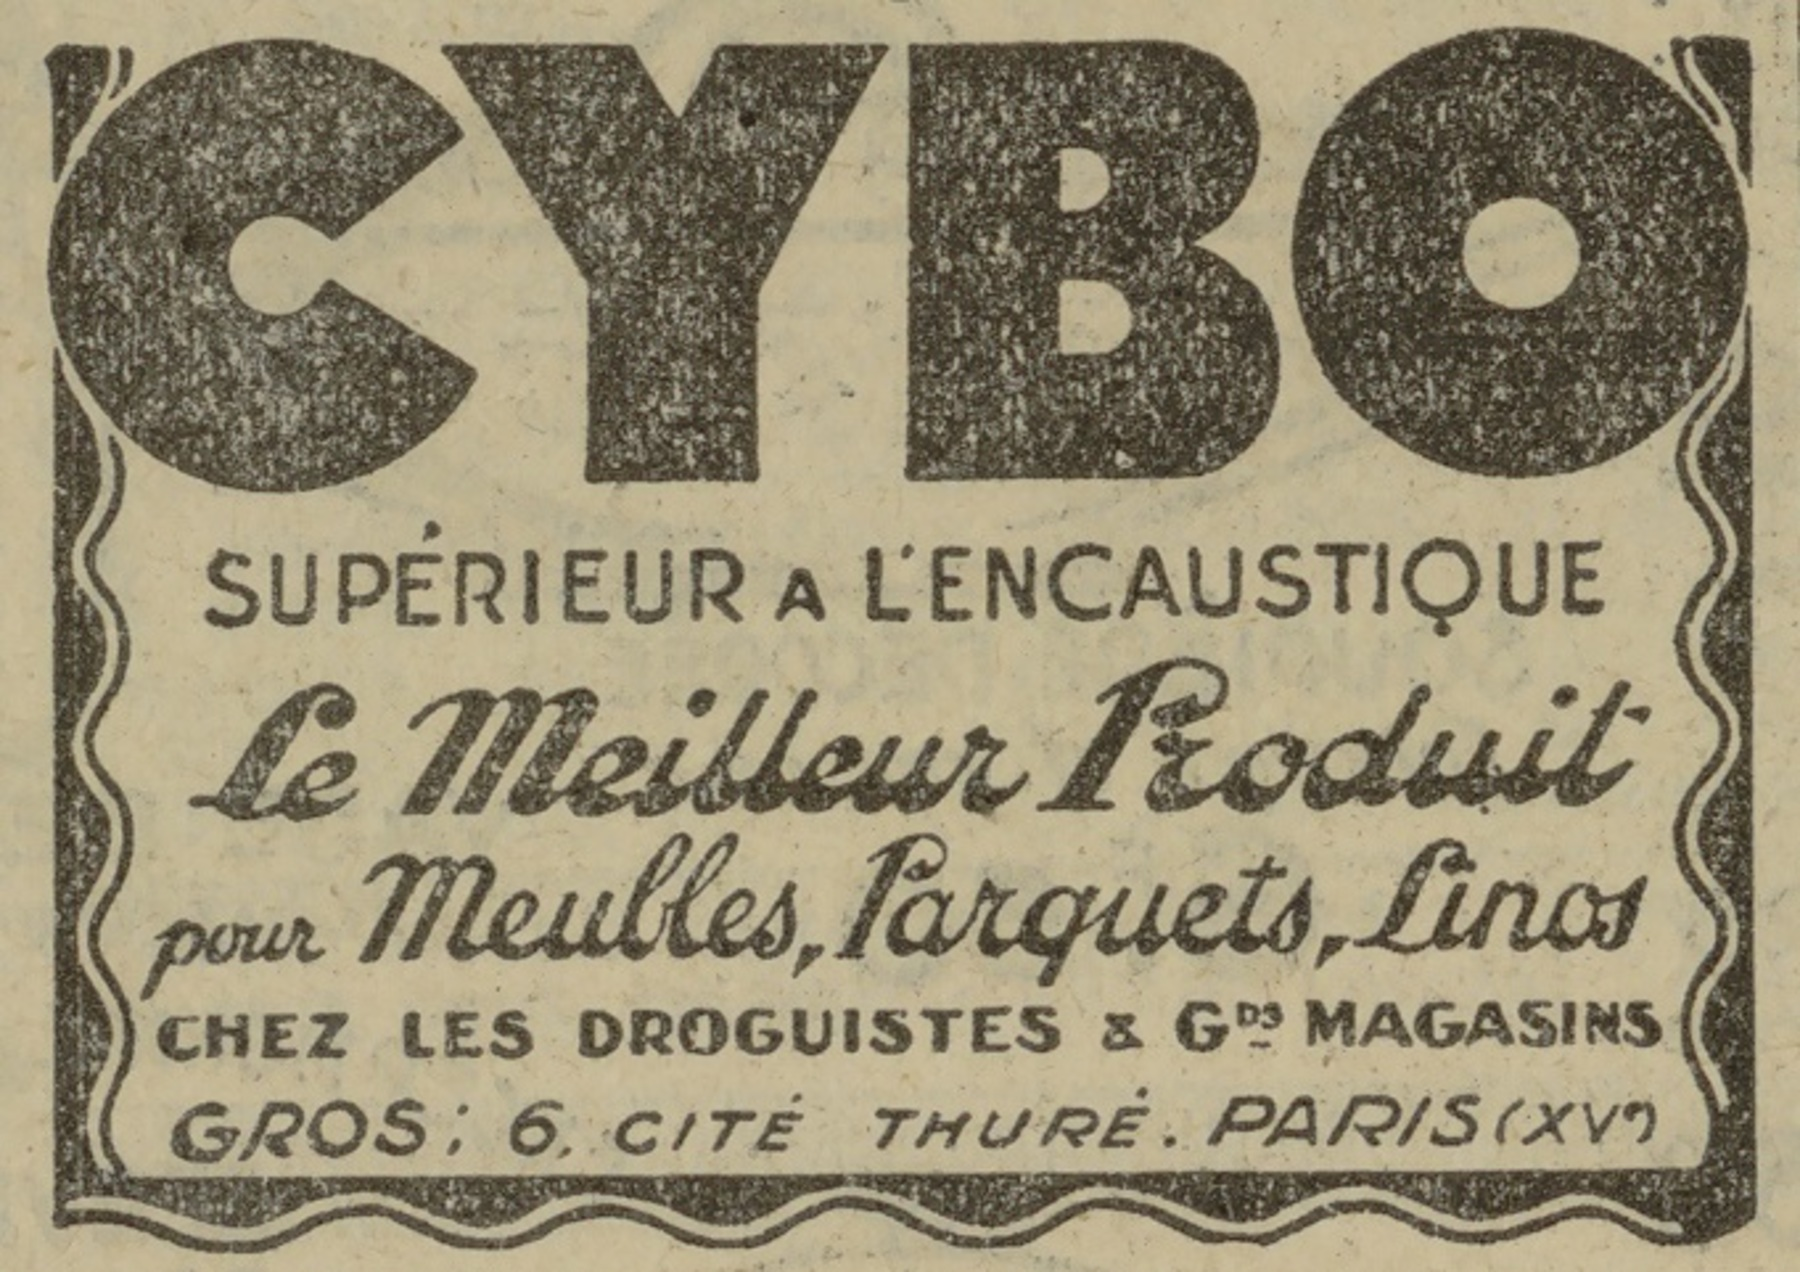 Contenu du Cybo